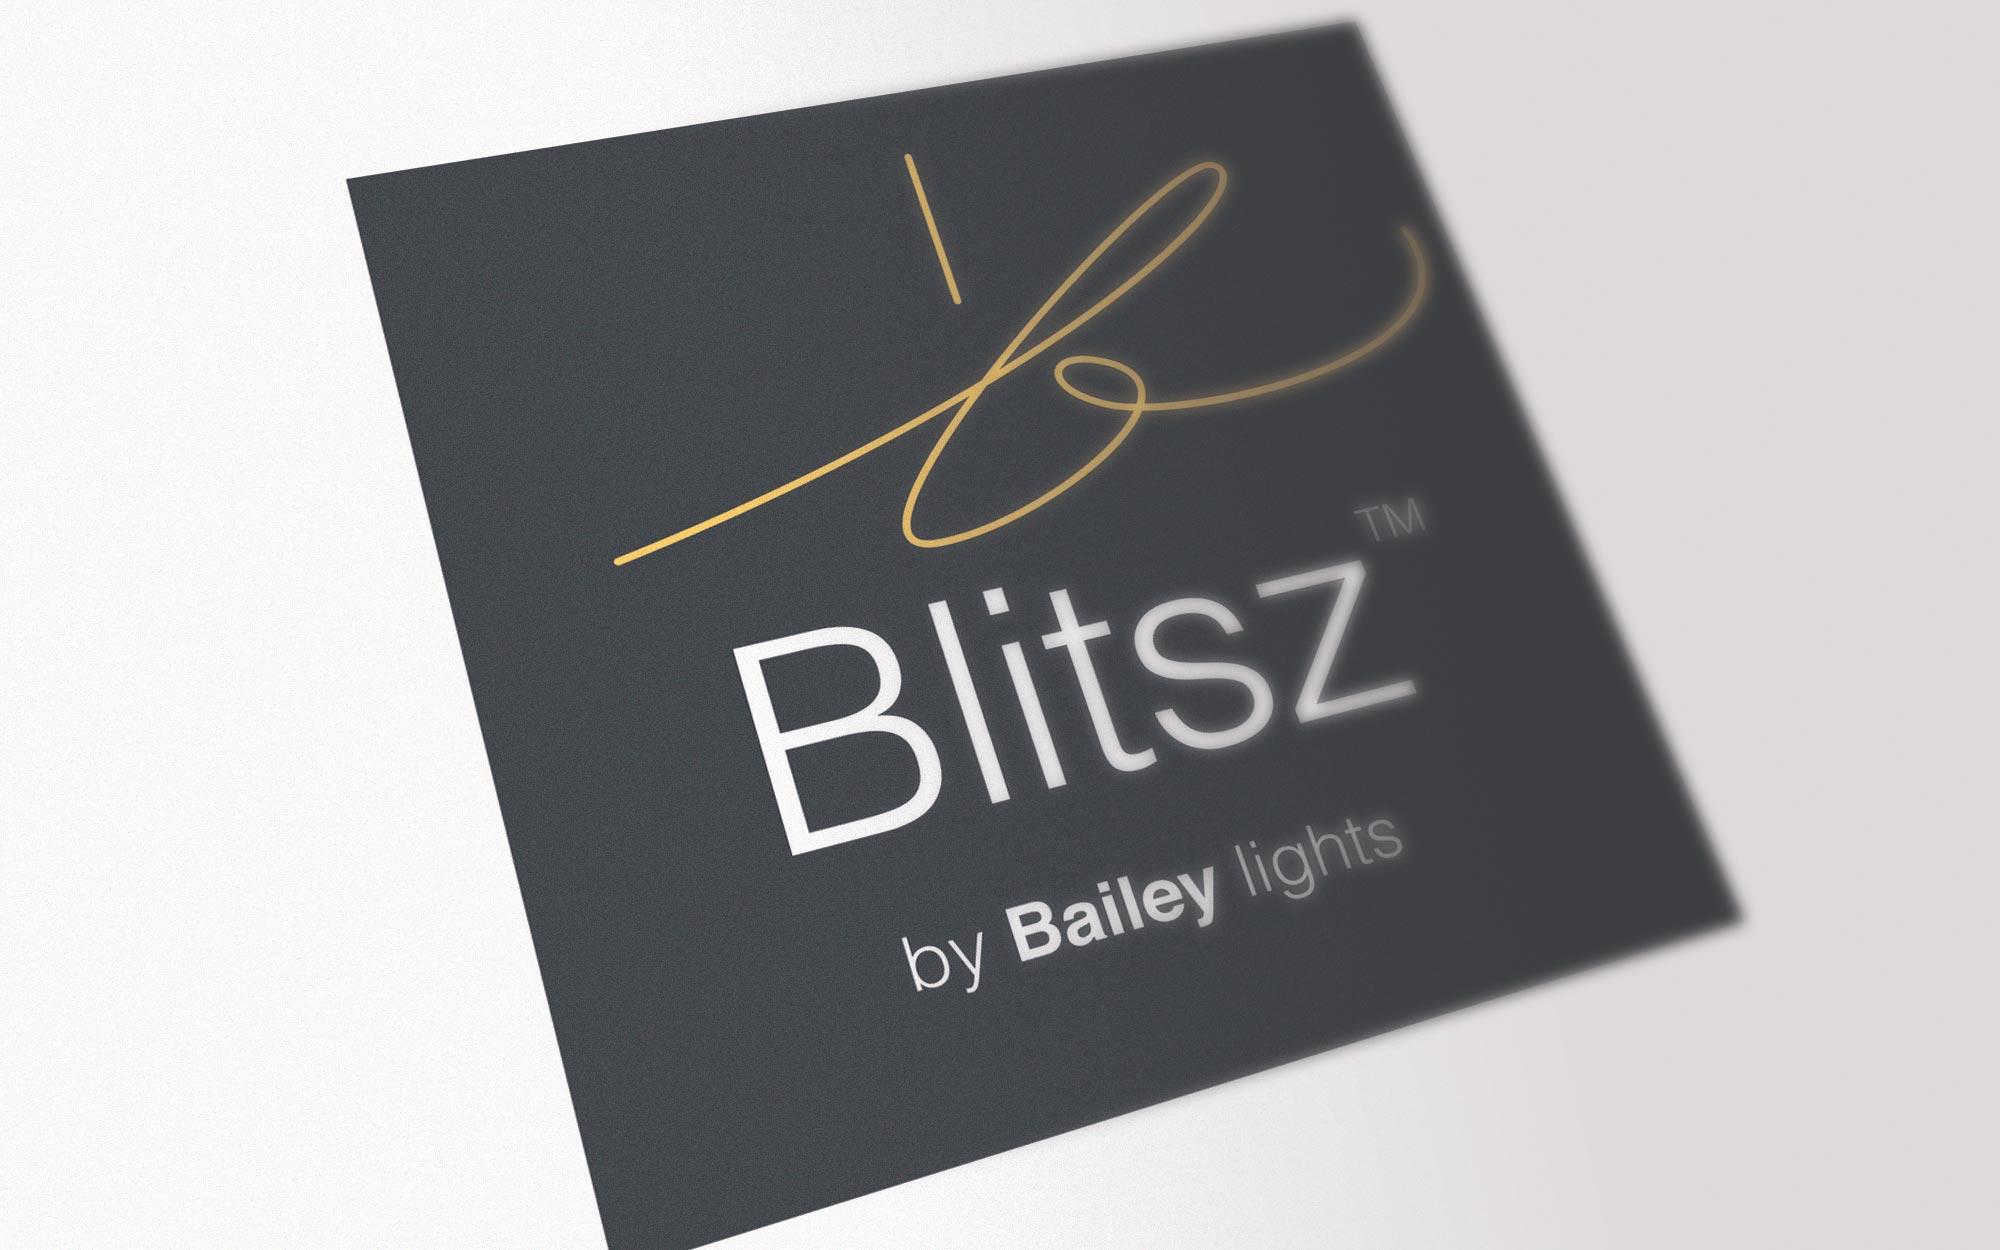 Blitsz Bailey logo ontwerp JAgd detail